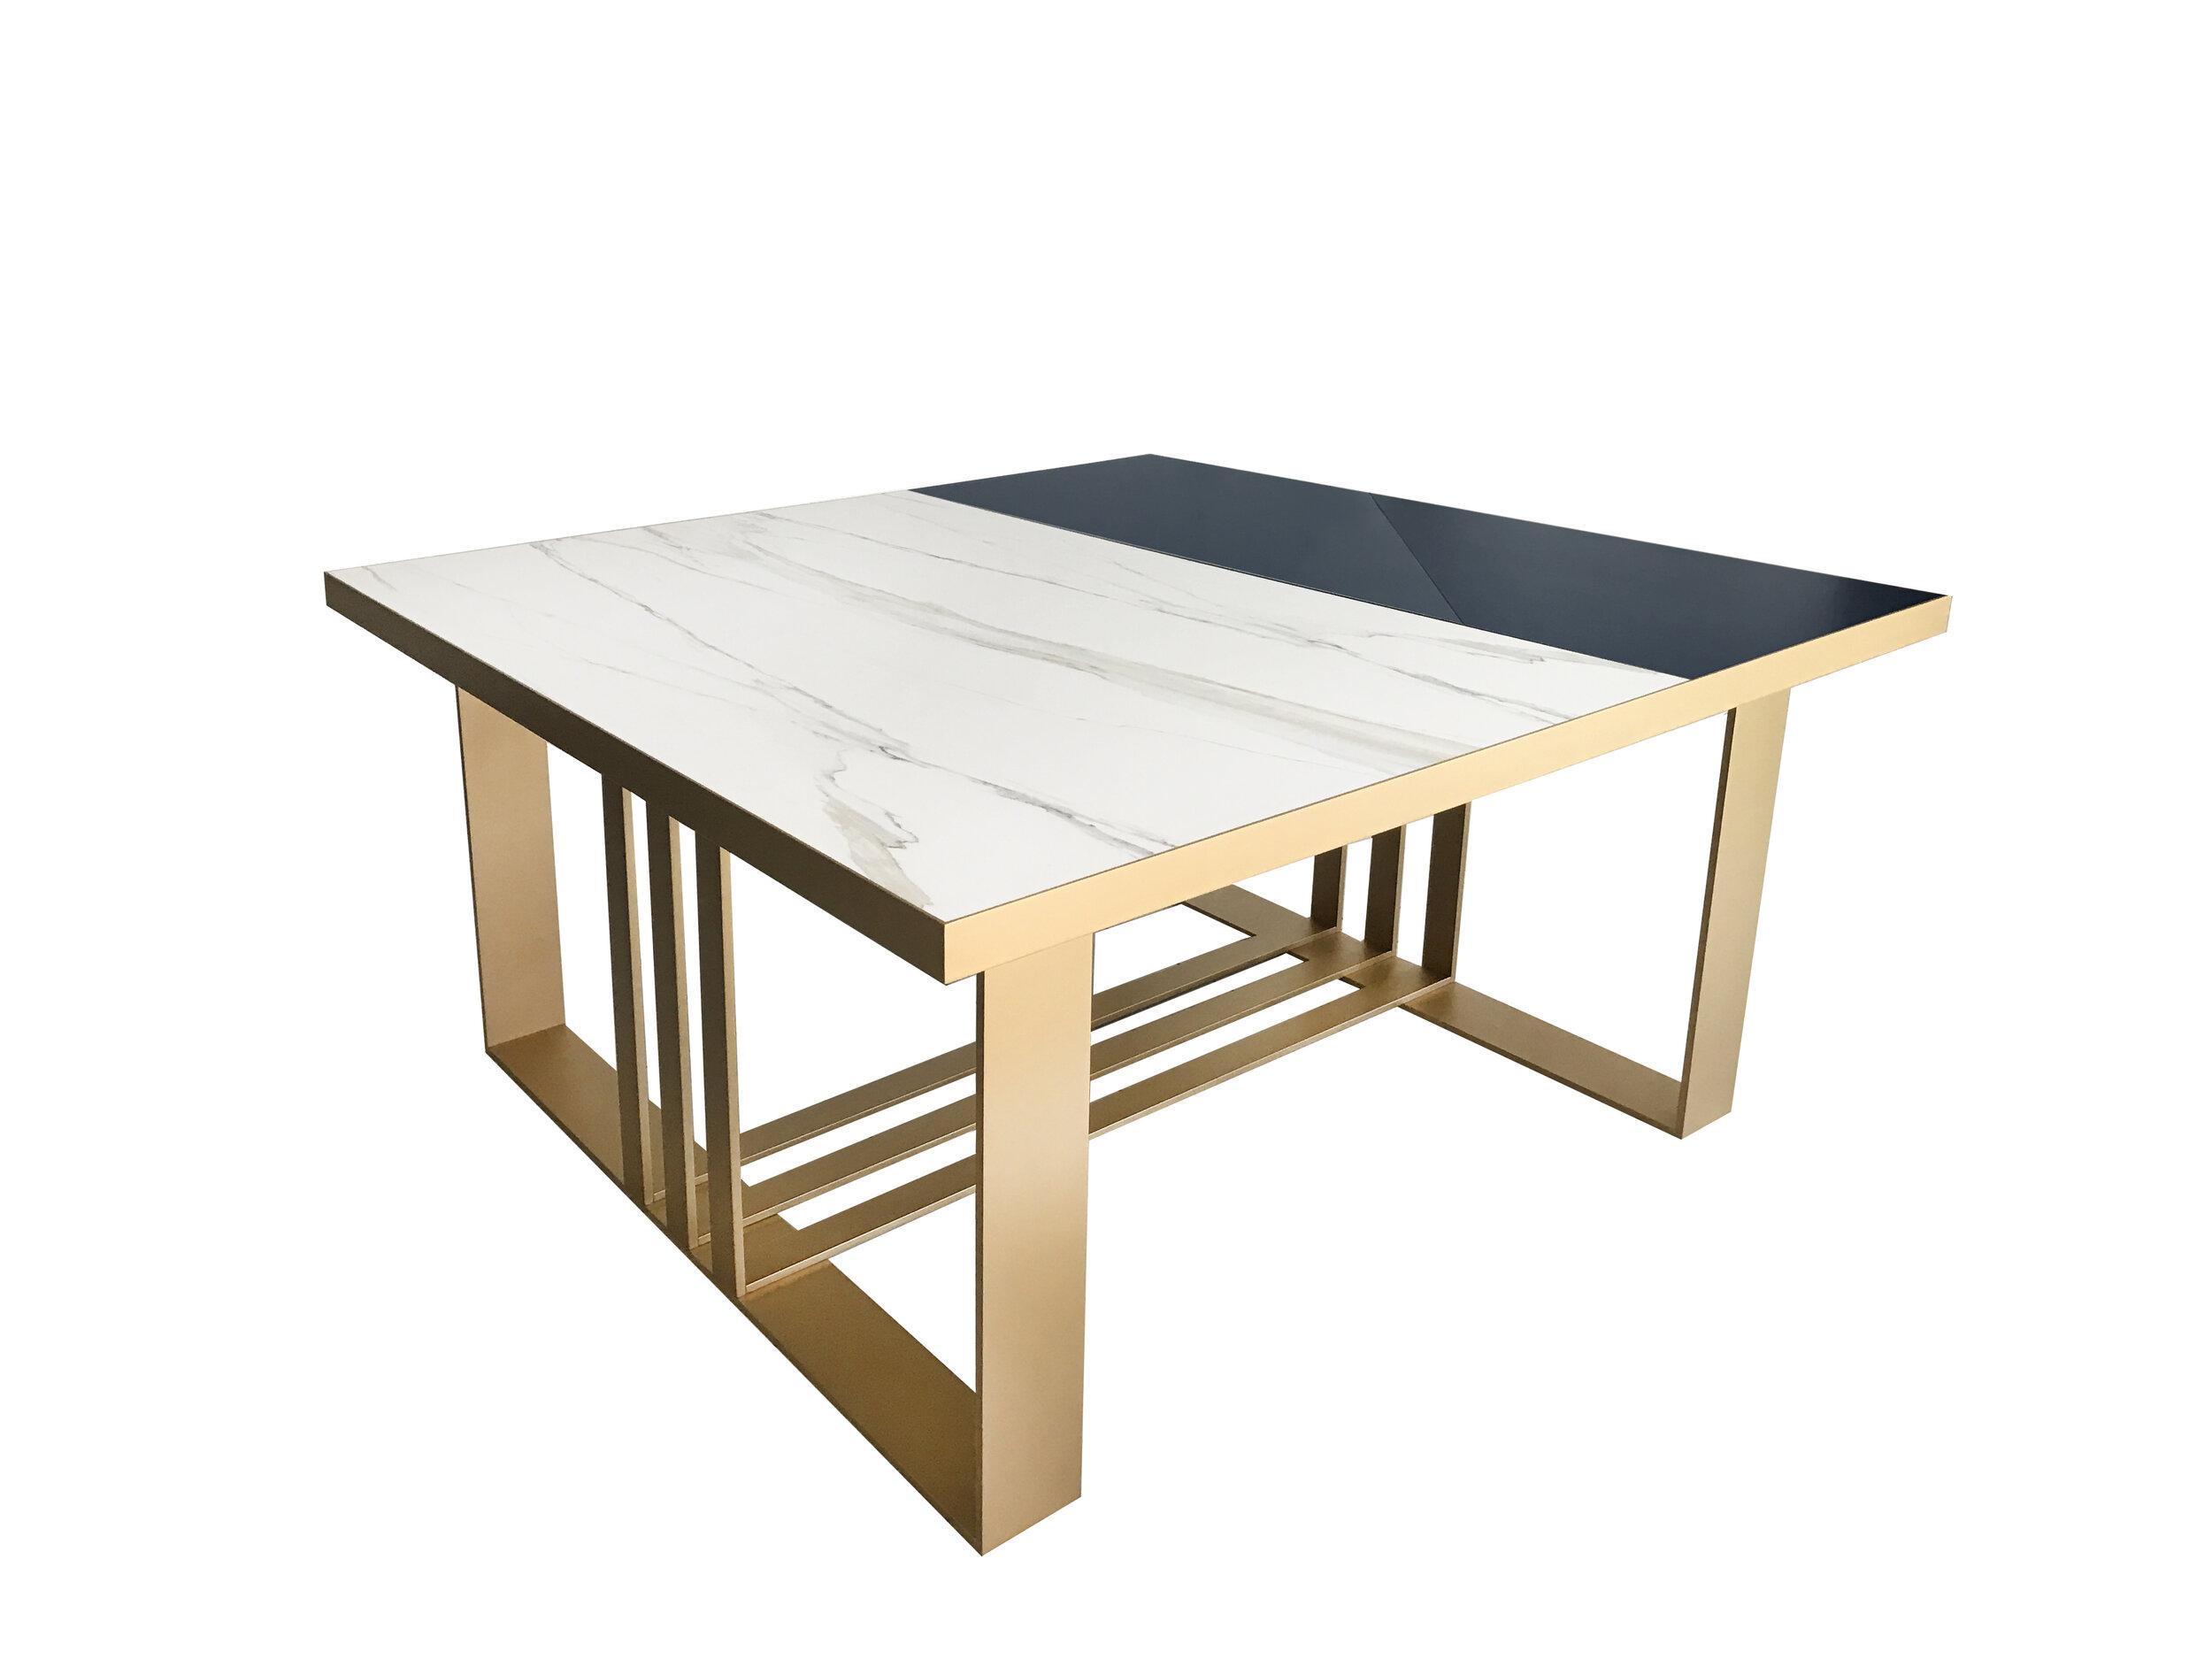 009.TABLE.01.jpg